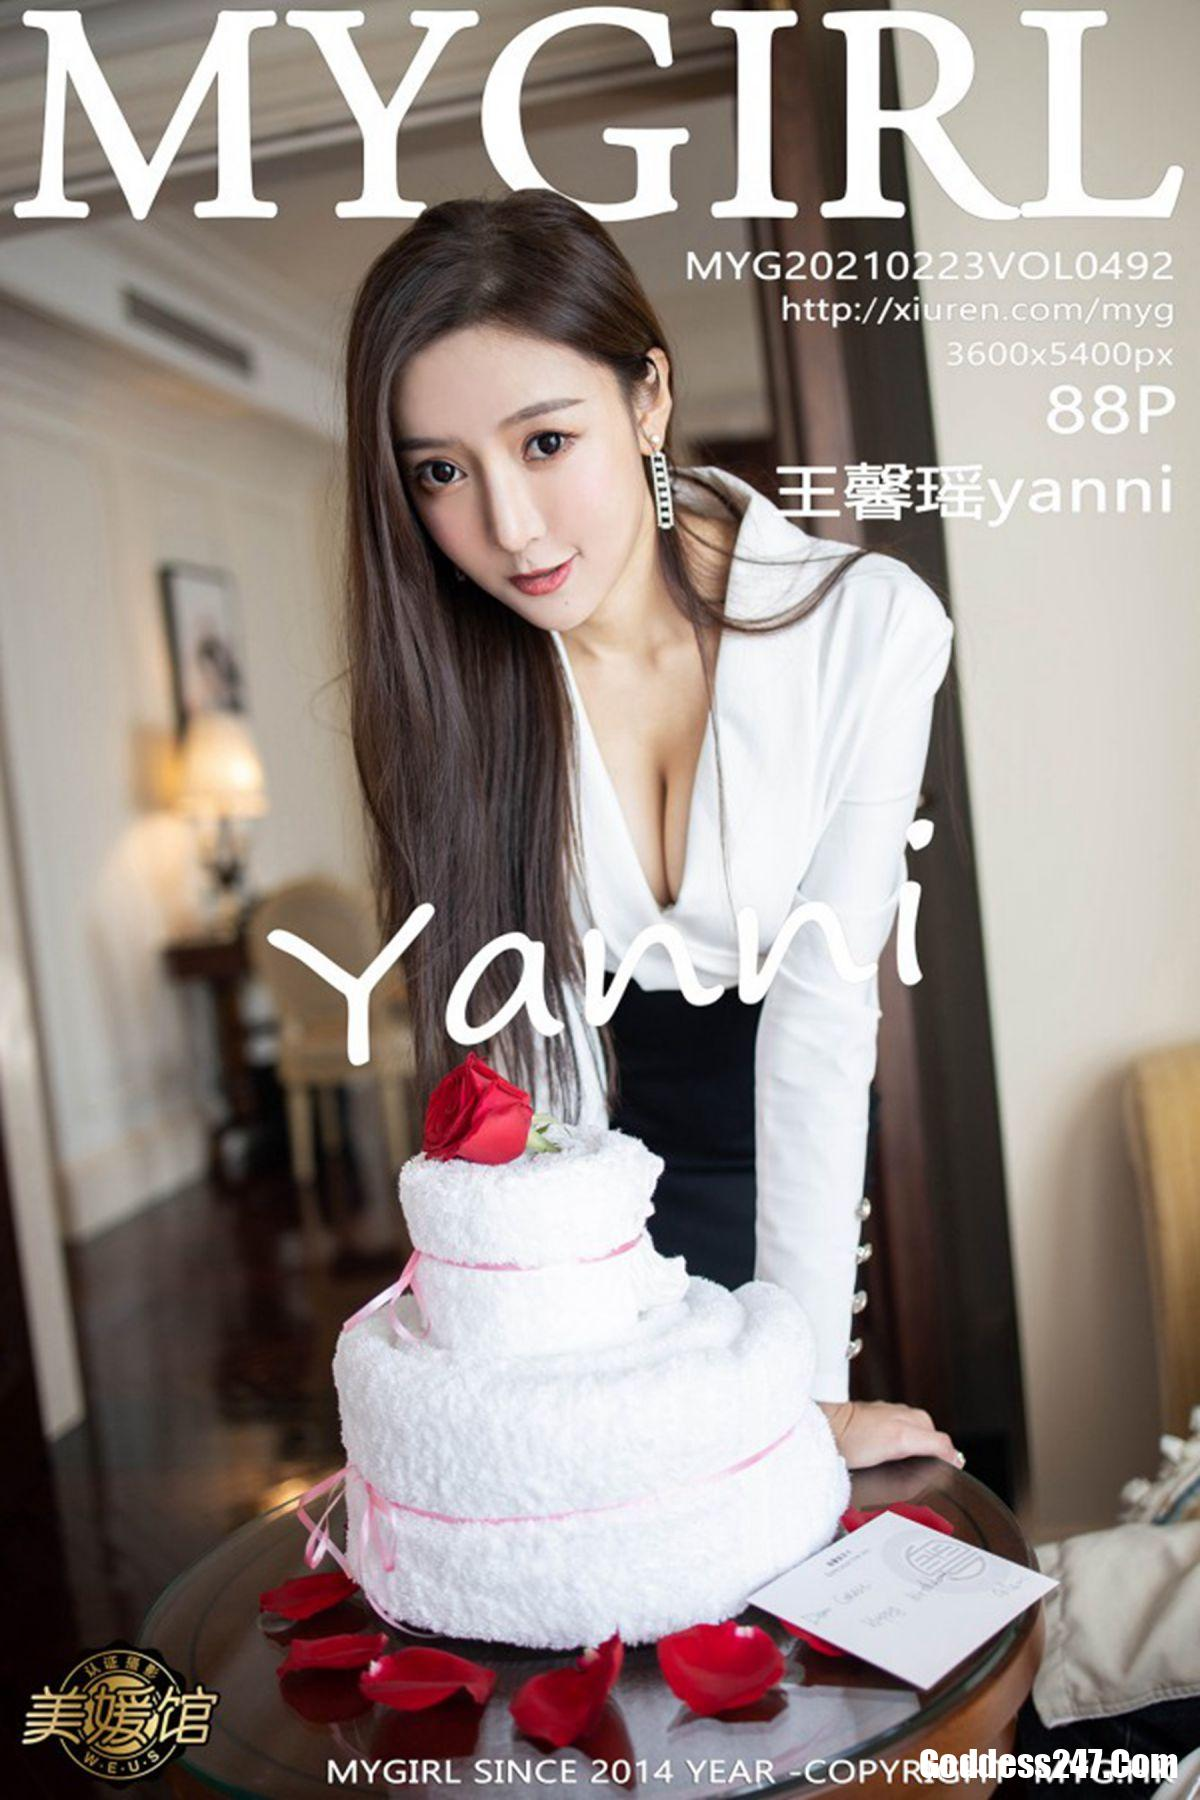 MyGirl美媛馆 Vol.492 王馨瑶yanni